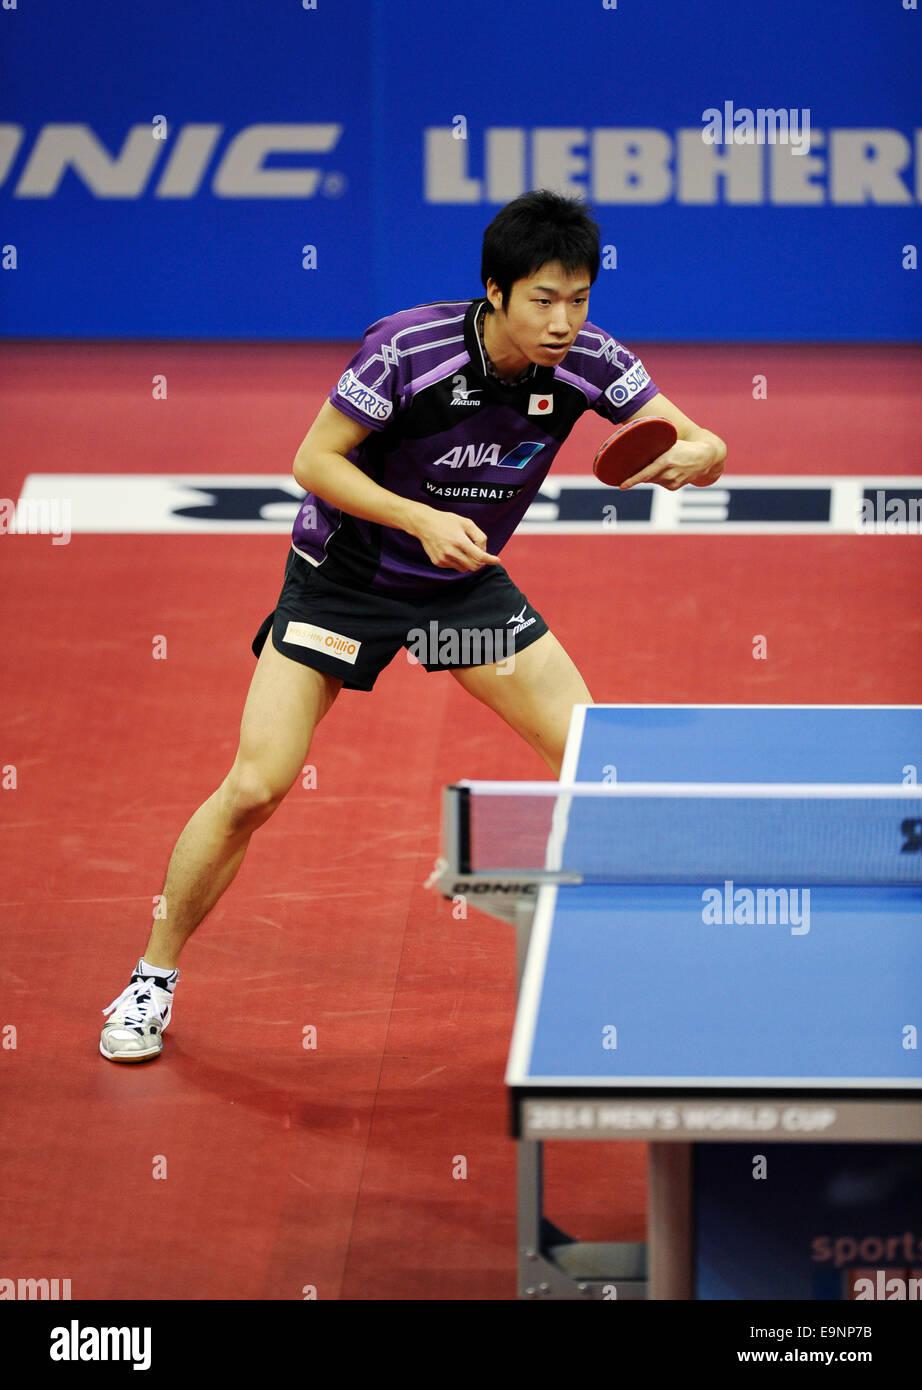 ISS Arena Duesseldorf, Allemagne 16.10.2014, Liebherr Coupe du monde de ping-pong , Jun Mizutani (JPN) Photo Stock